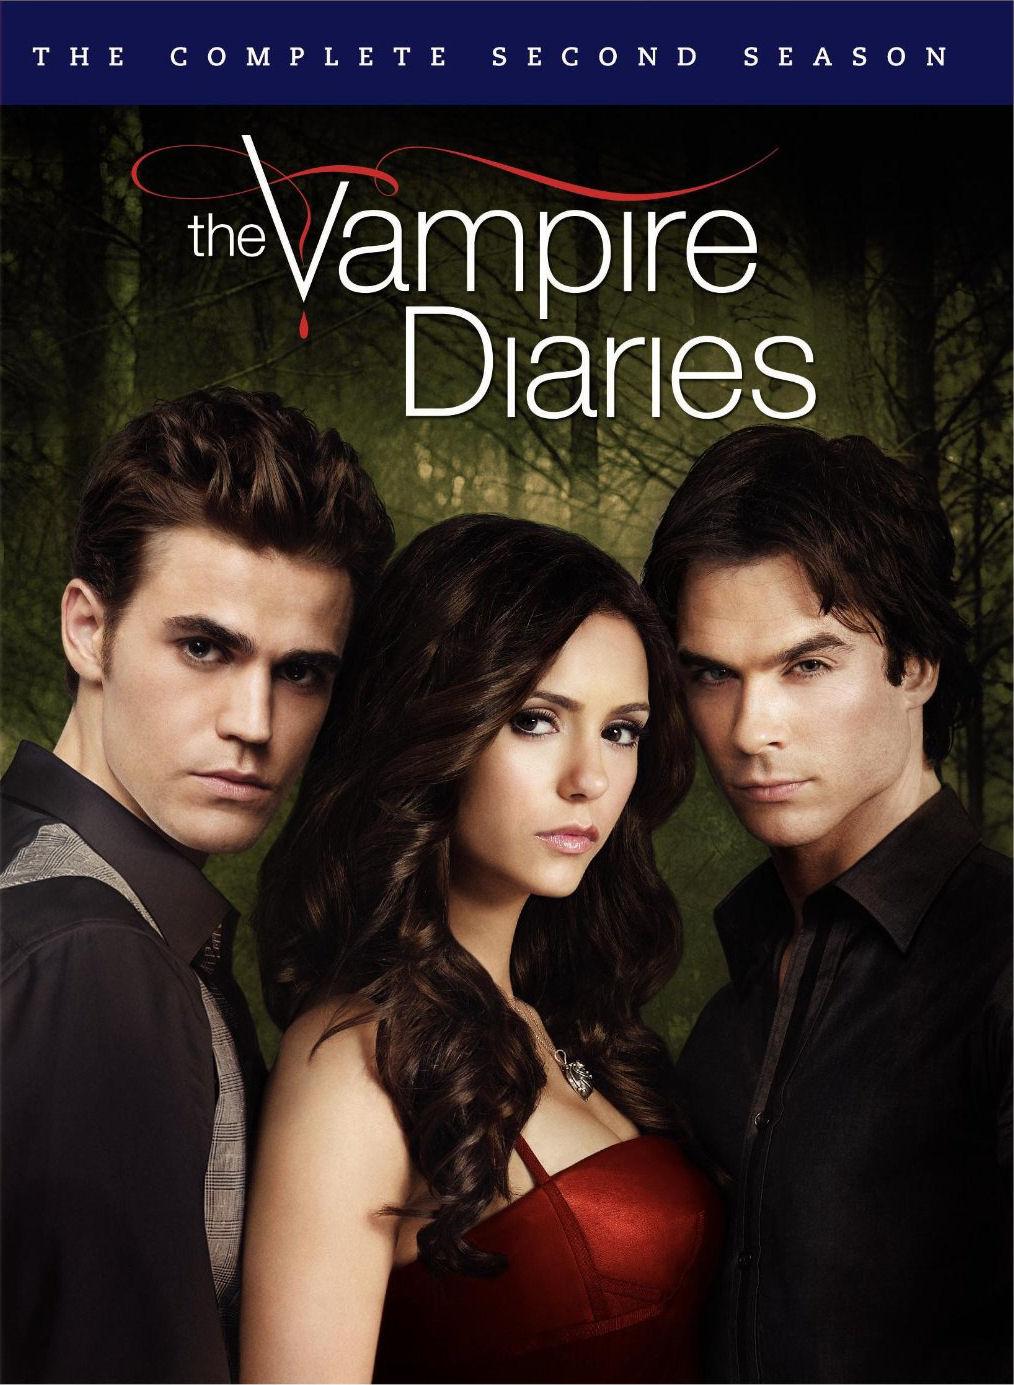 the vampire diaries season 2 cover